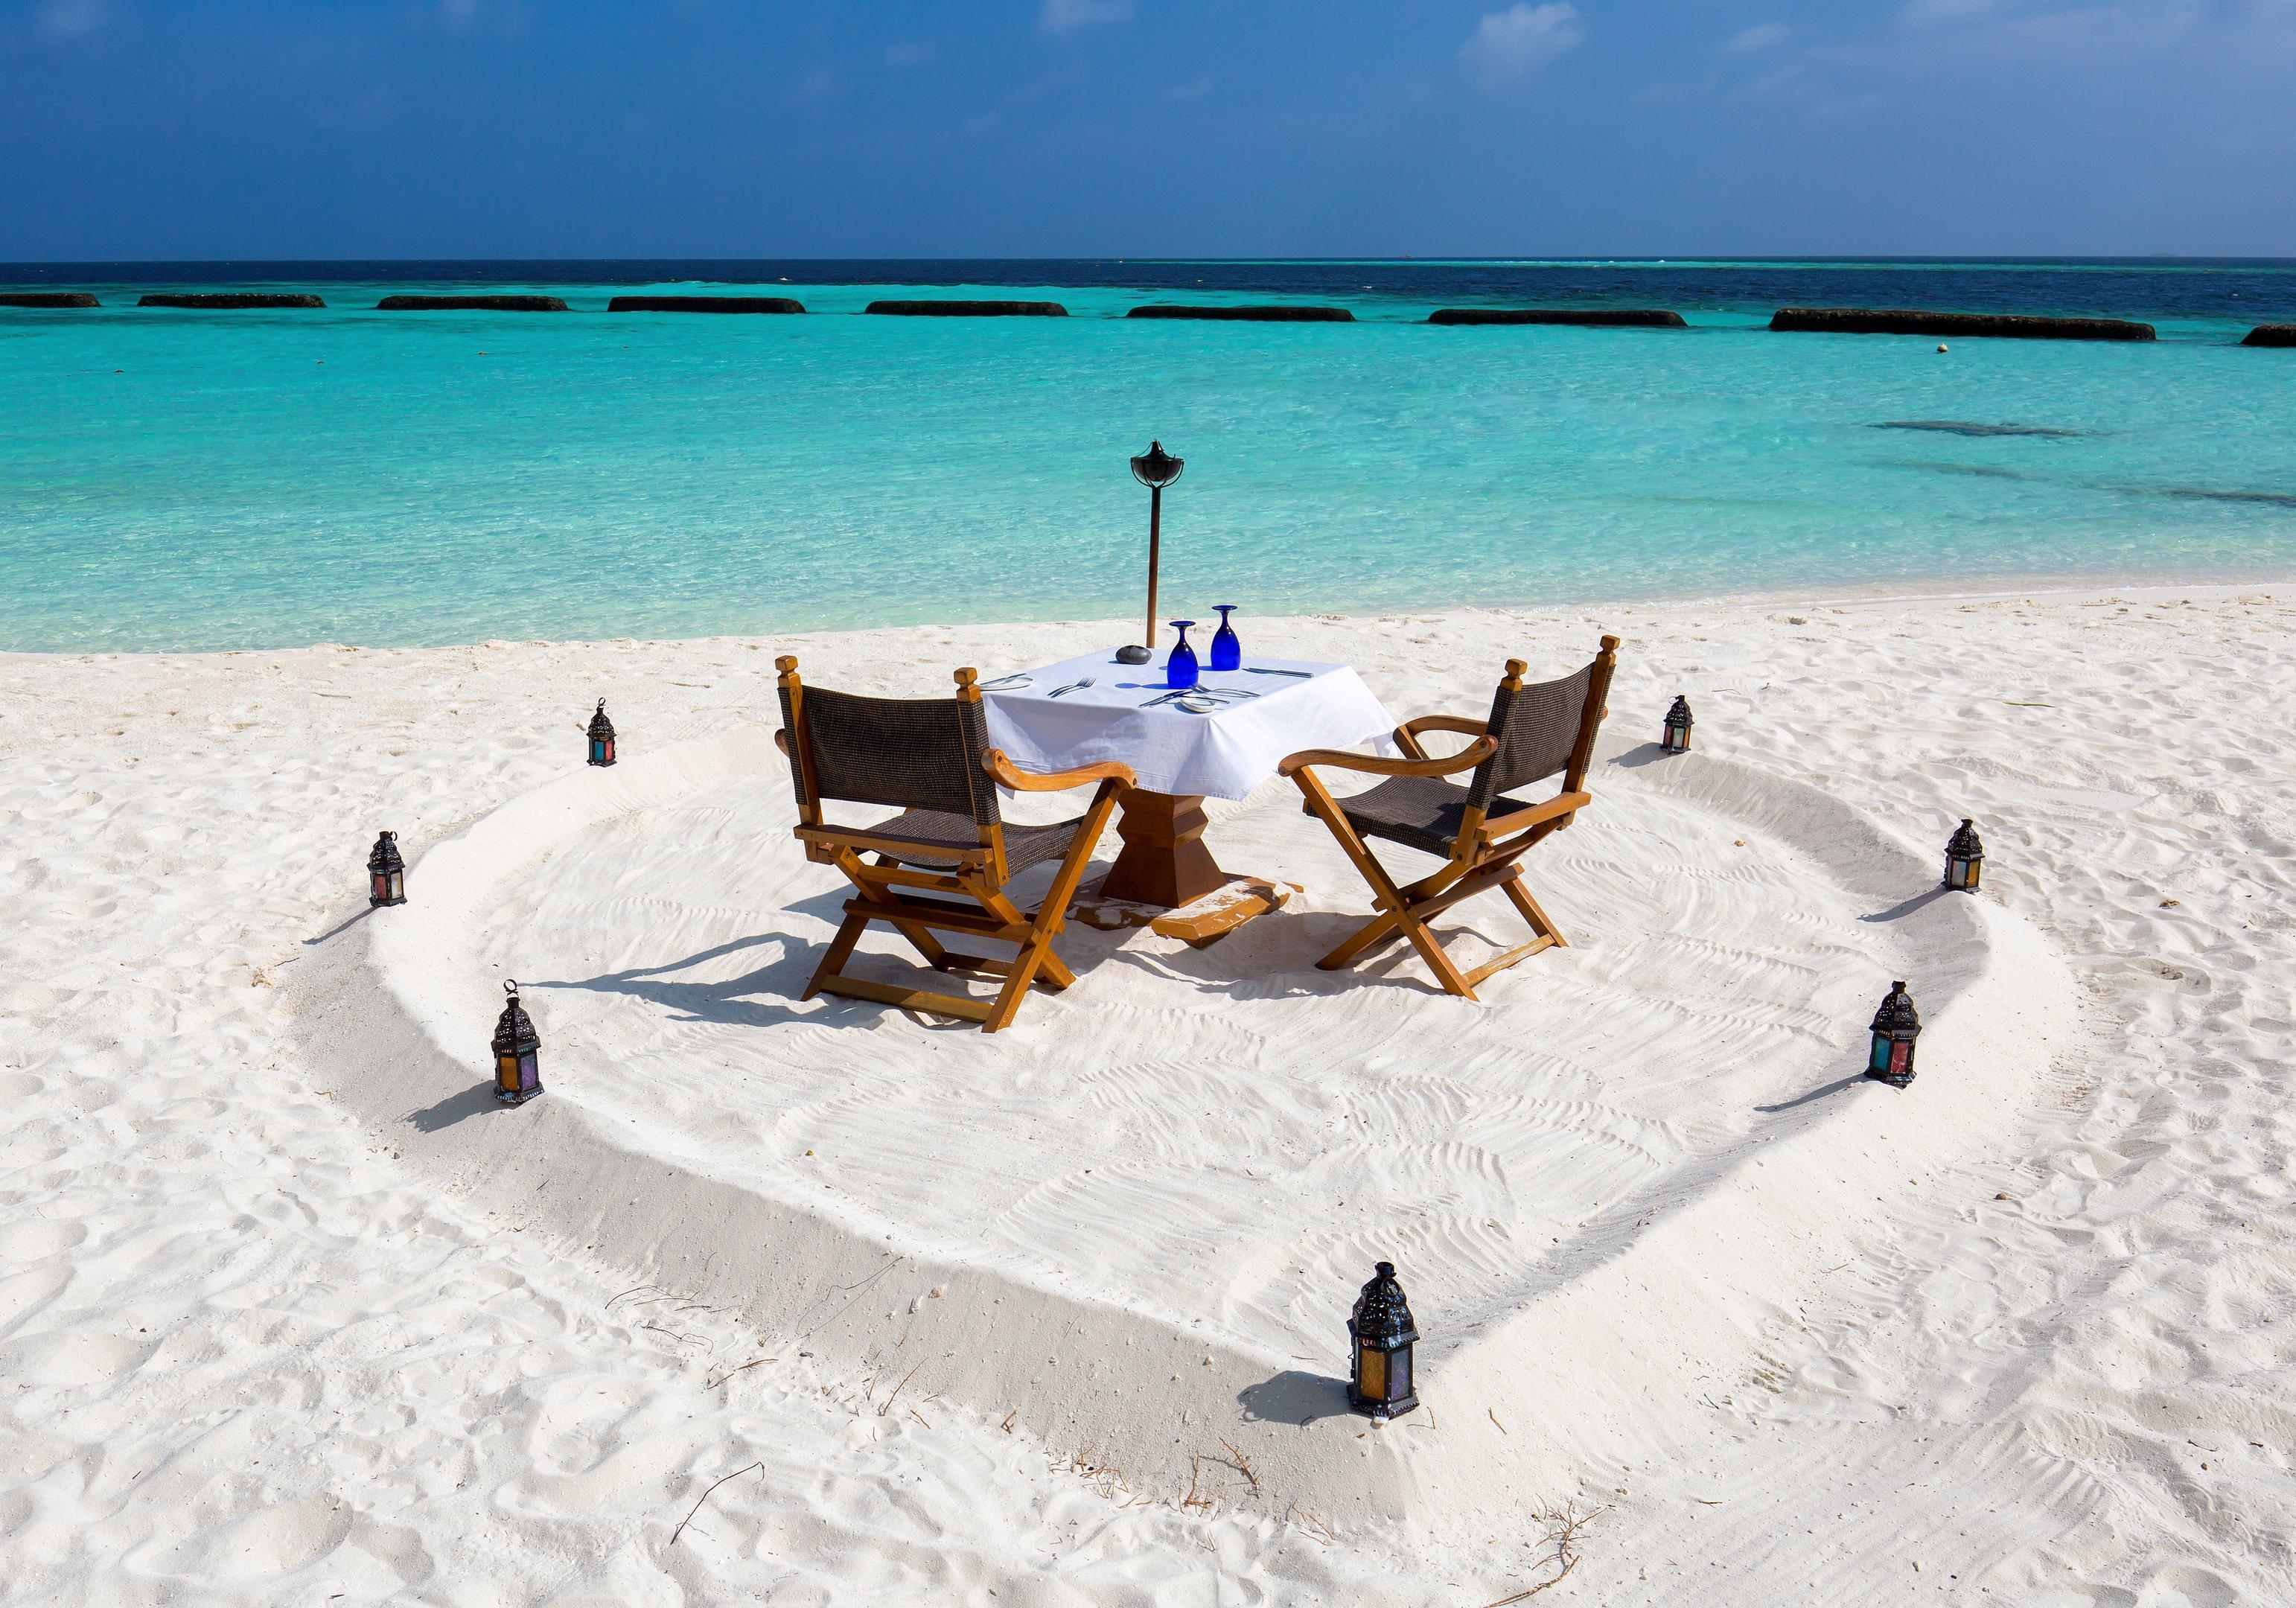 Almoço romântico nas Maldivas